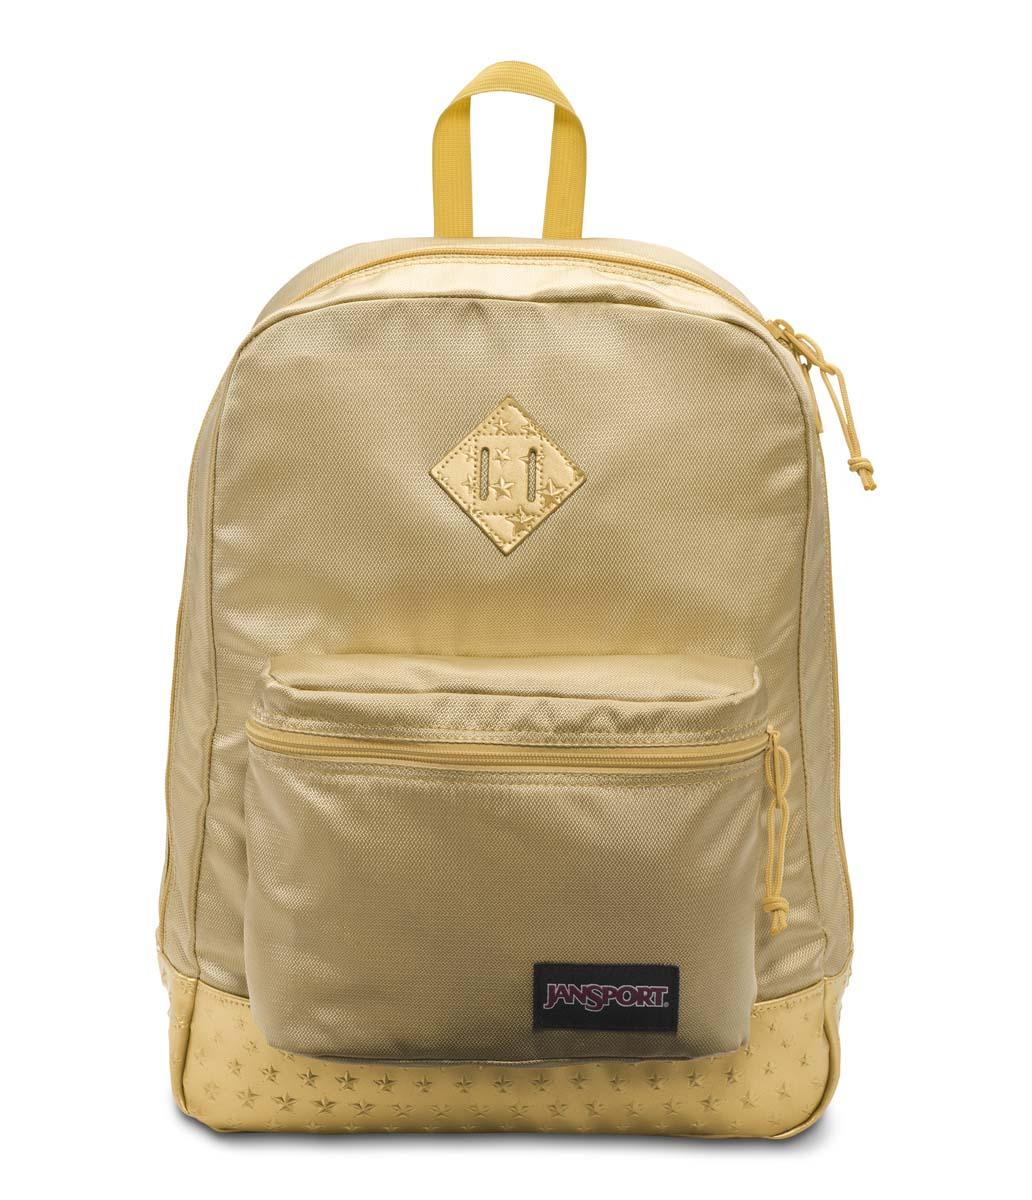 JanSport กระเป๋าเป้ รุ่น Super FX - Gold 3D Stars